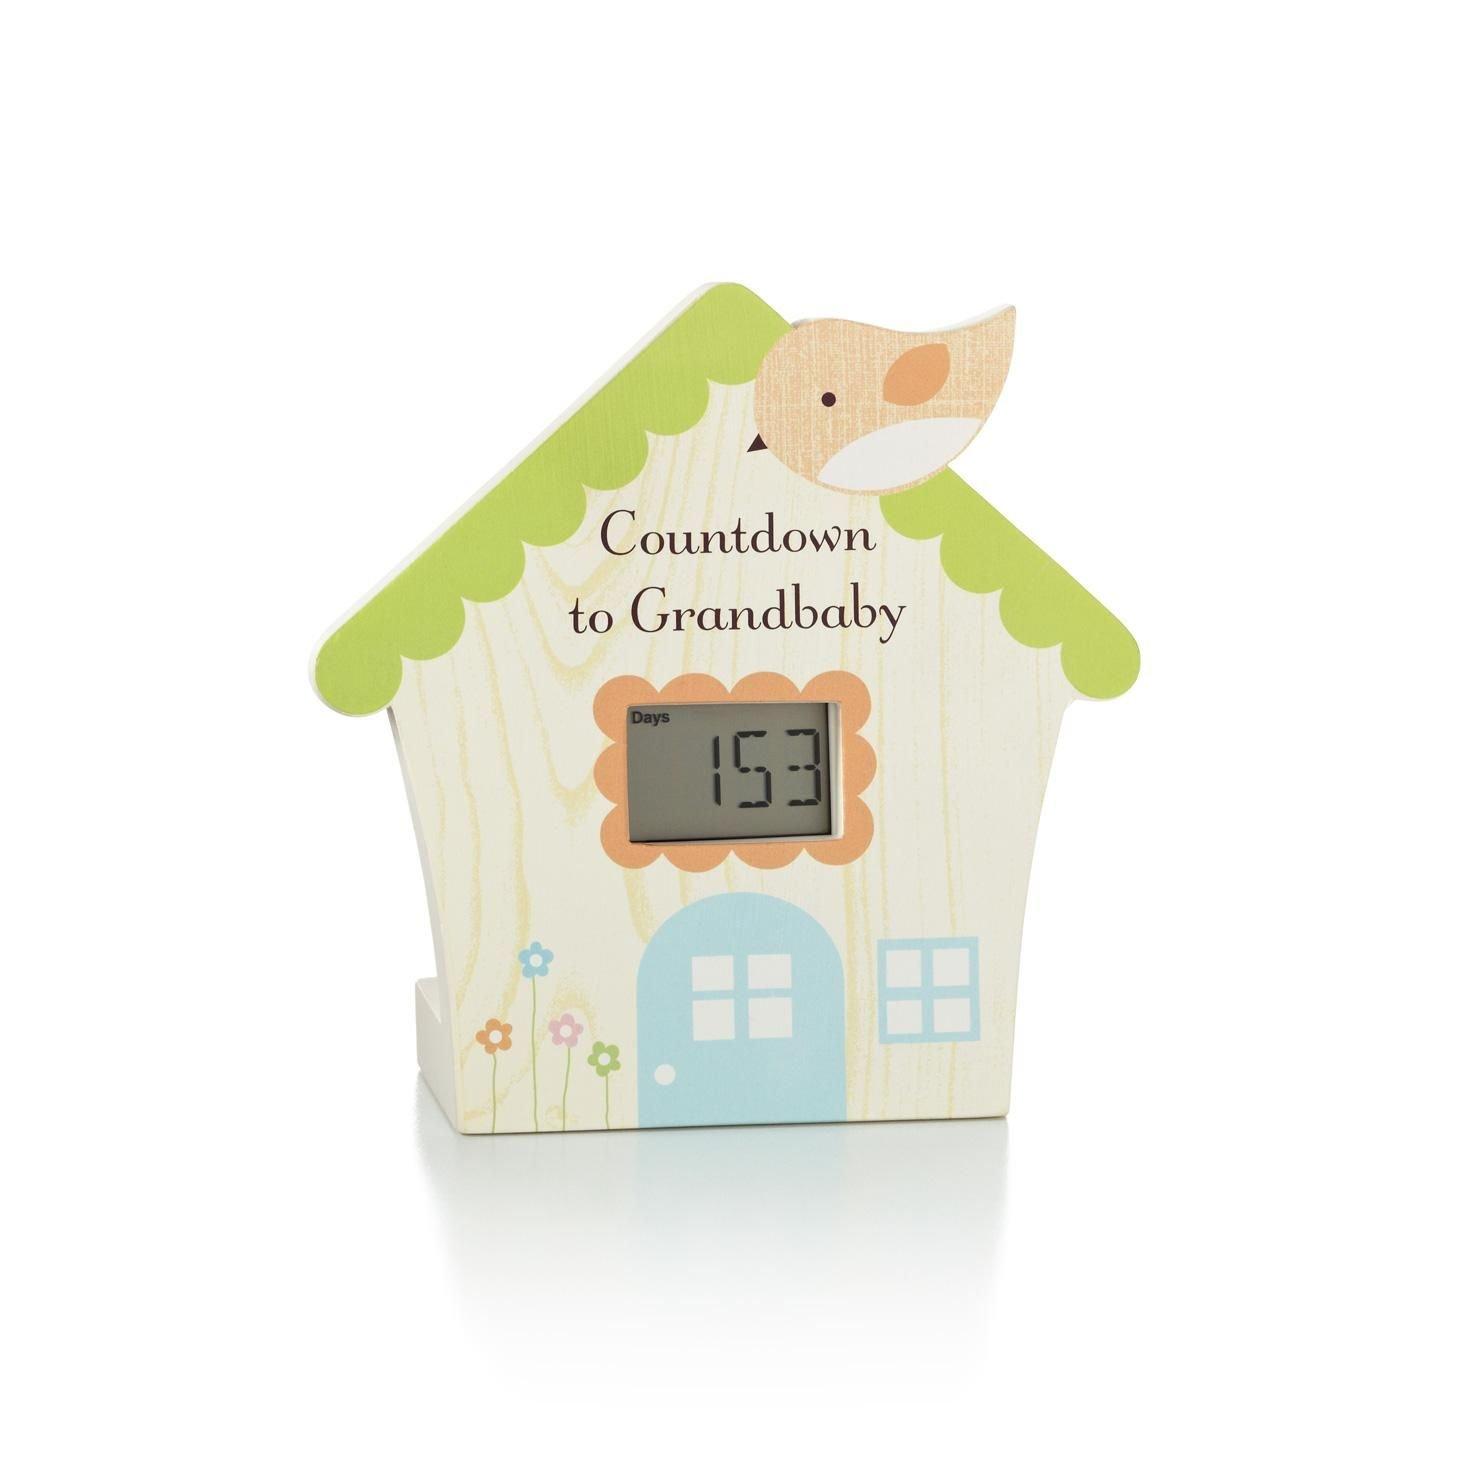 Grandbaby Digital Countdown Clock - General Calendar Mitrinty Count Down Calendar